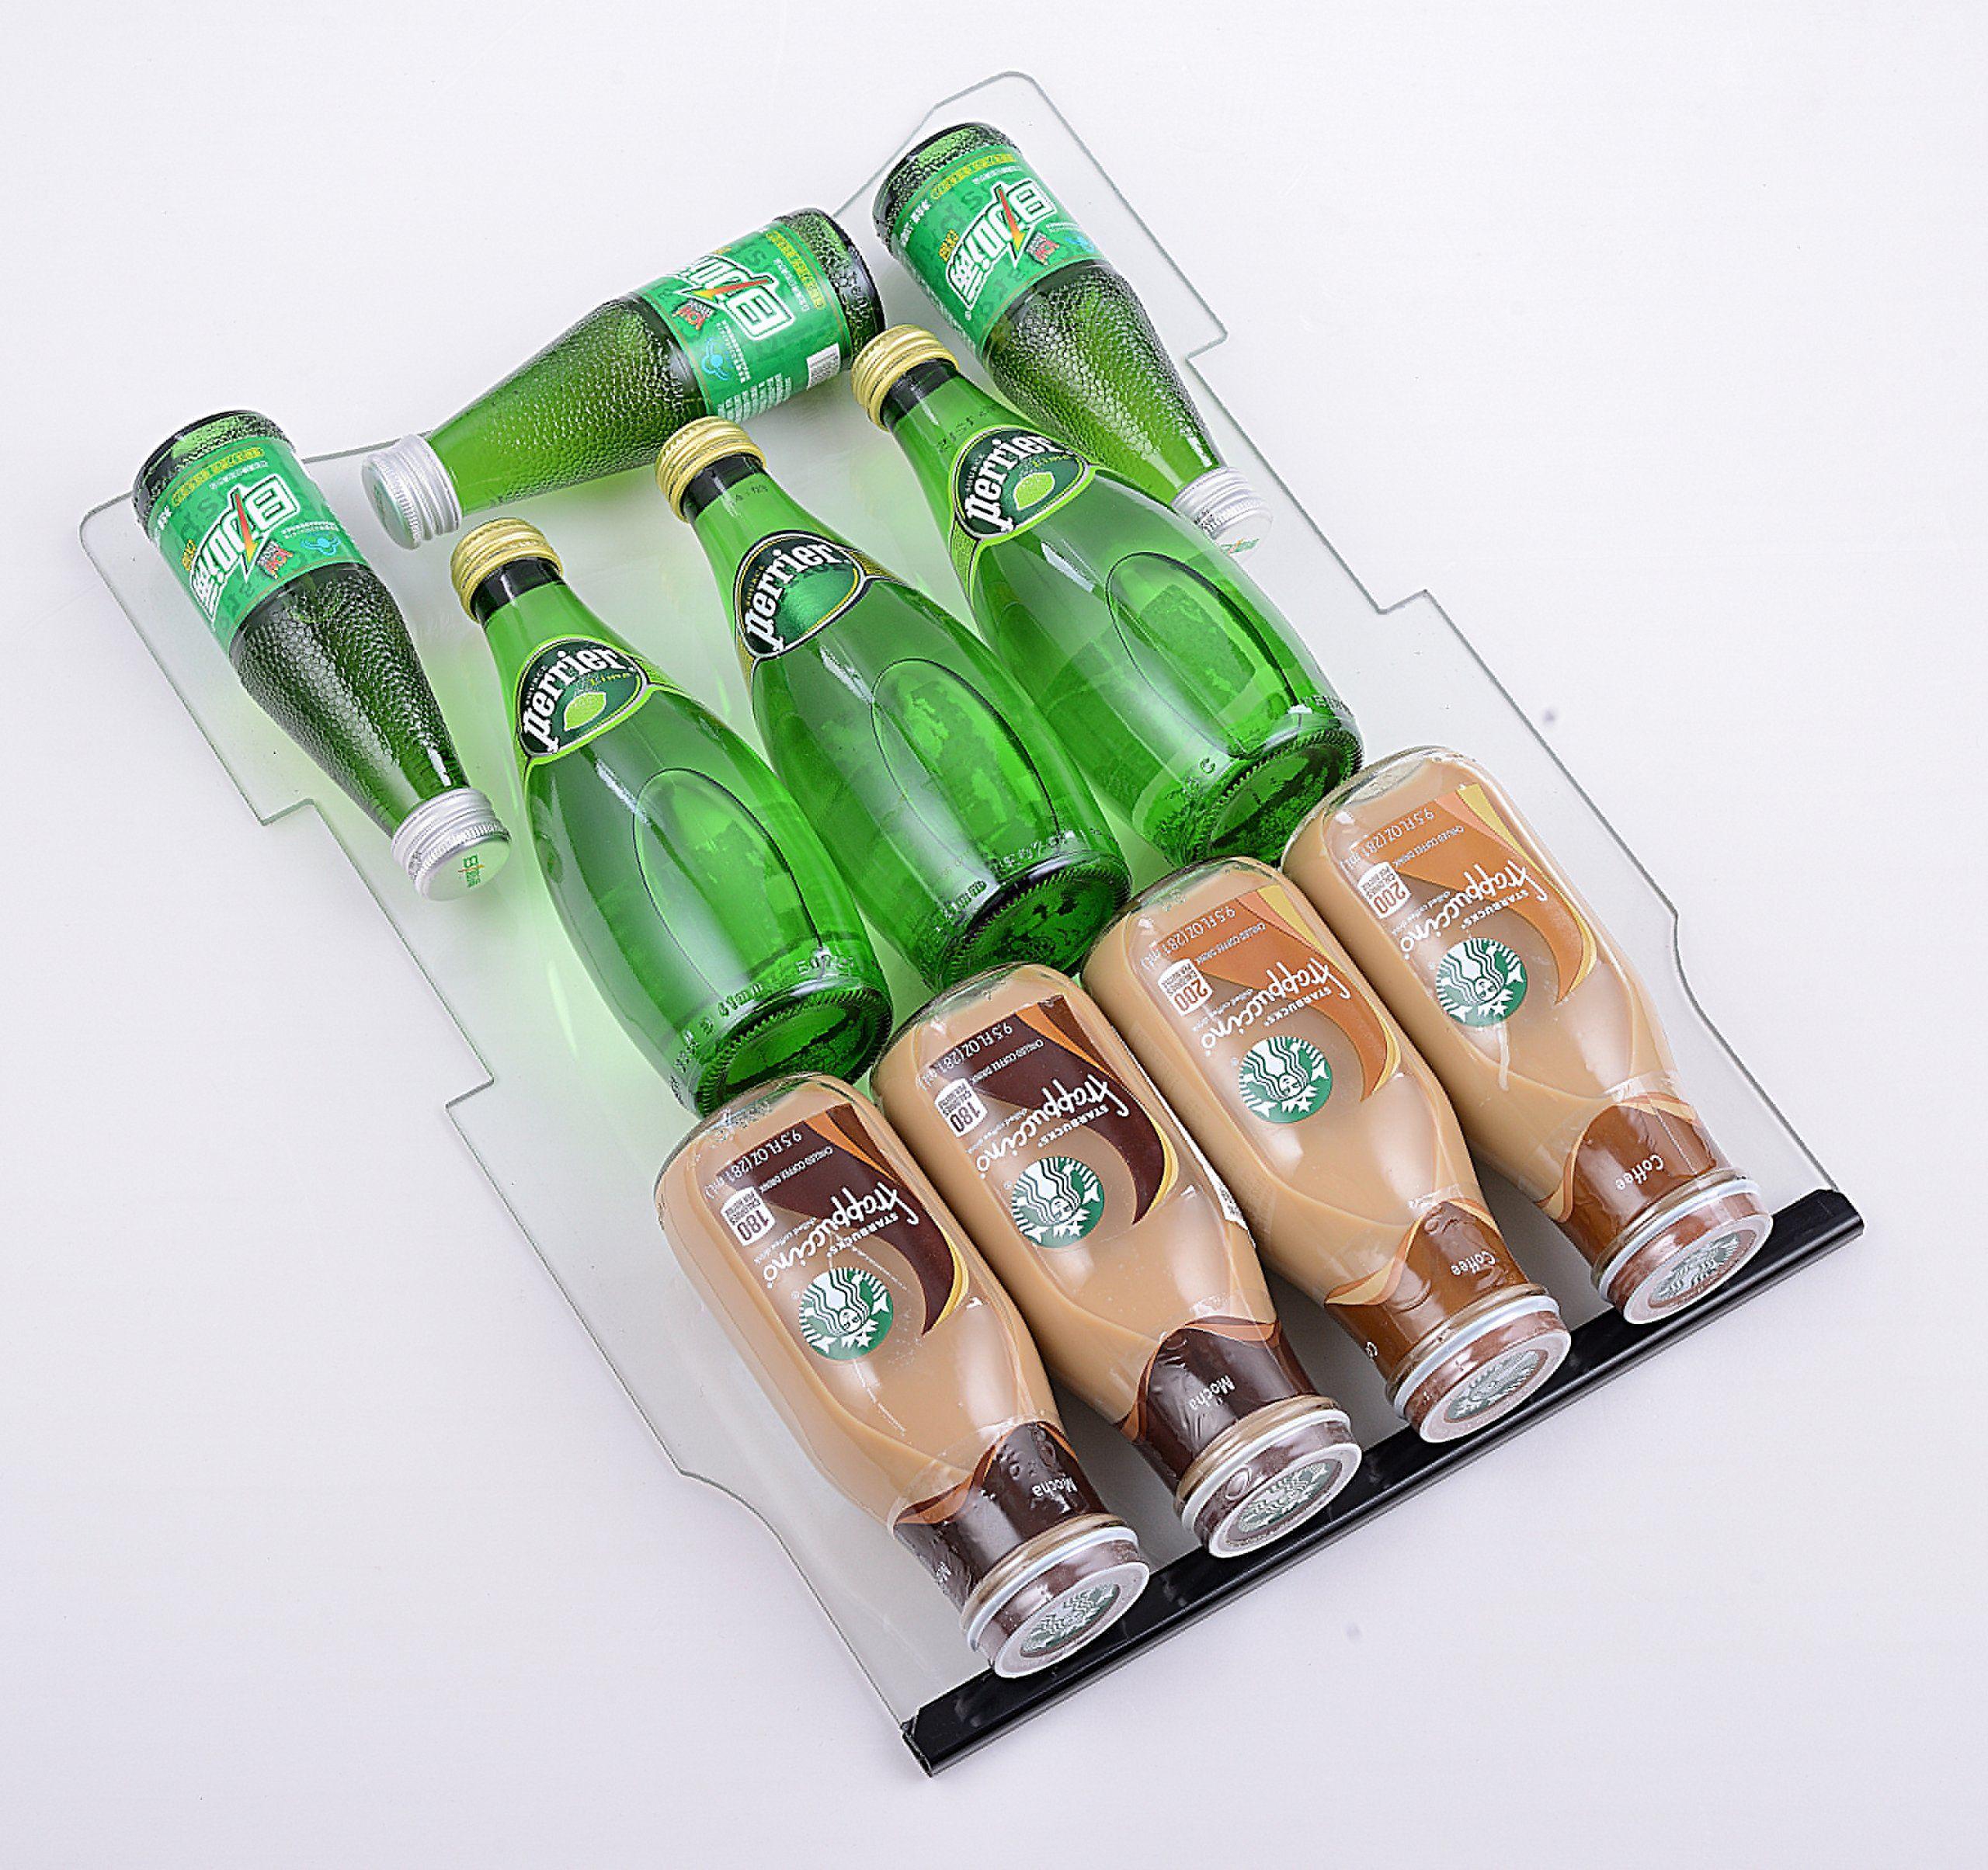 Sinoartizan ST33BC 76 Can Compressor Beverage Cooler 15â